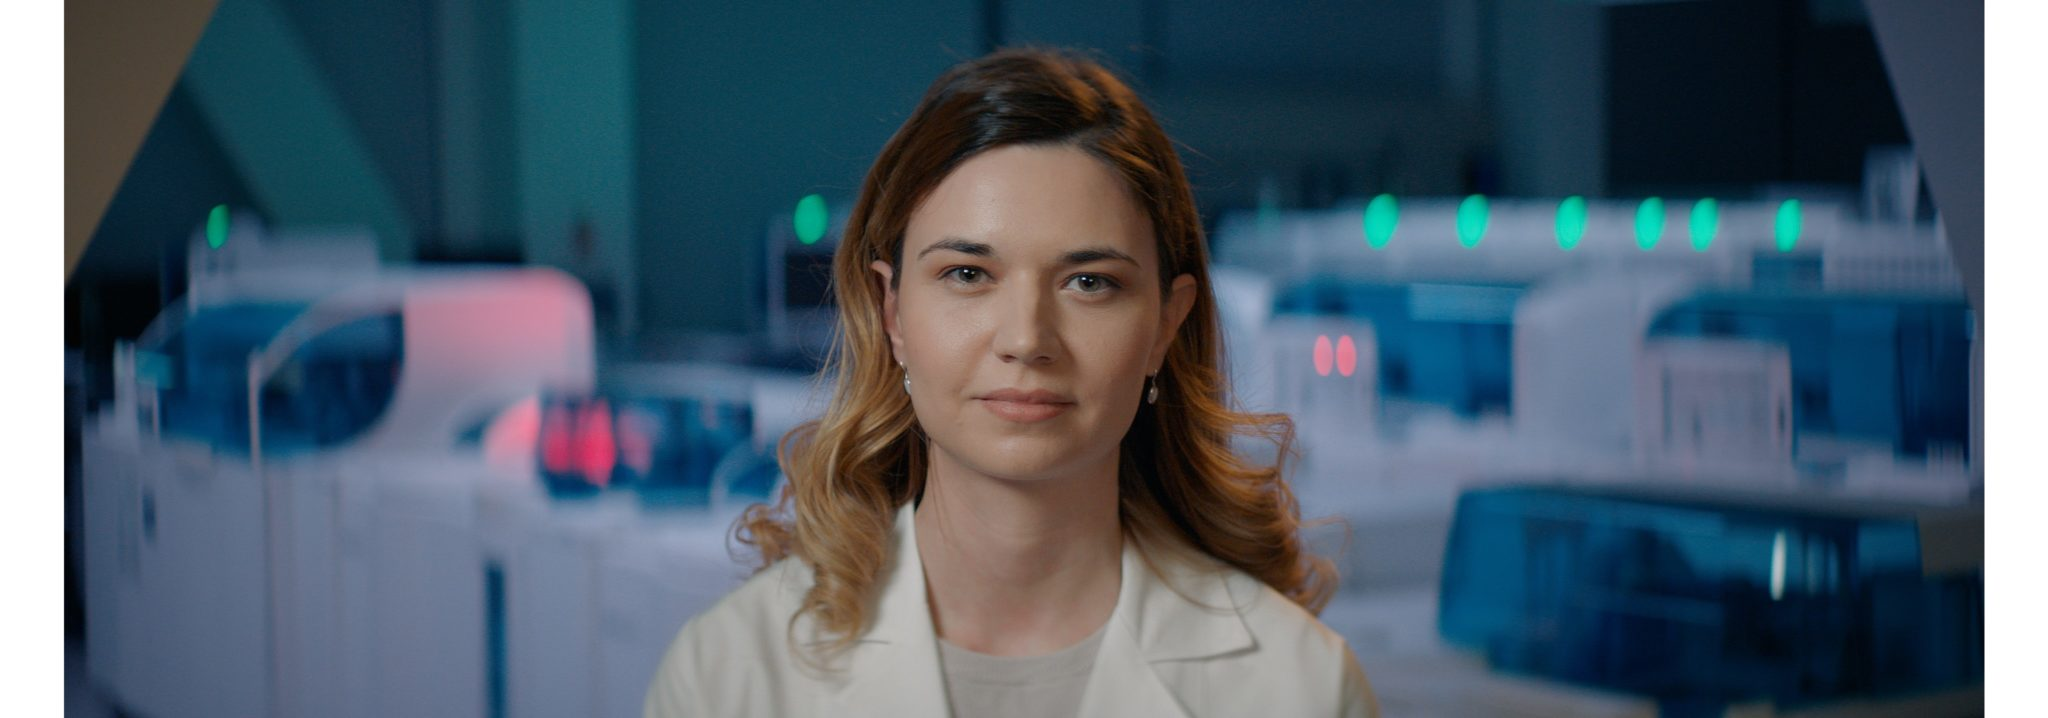 Nicoleta Laura Baicu - Synevo